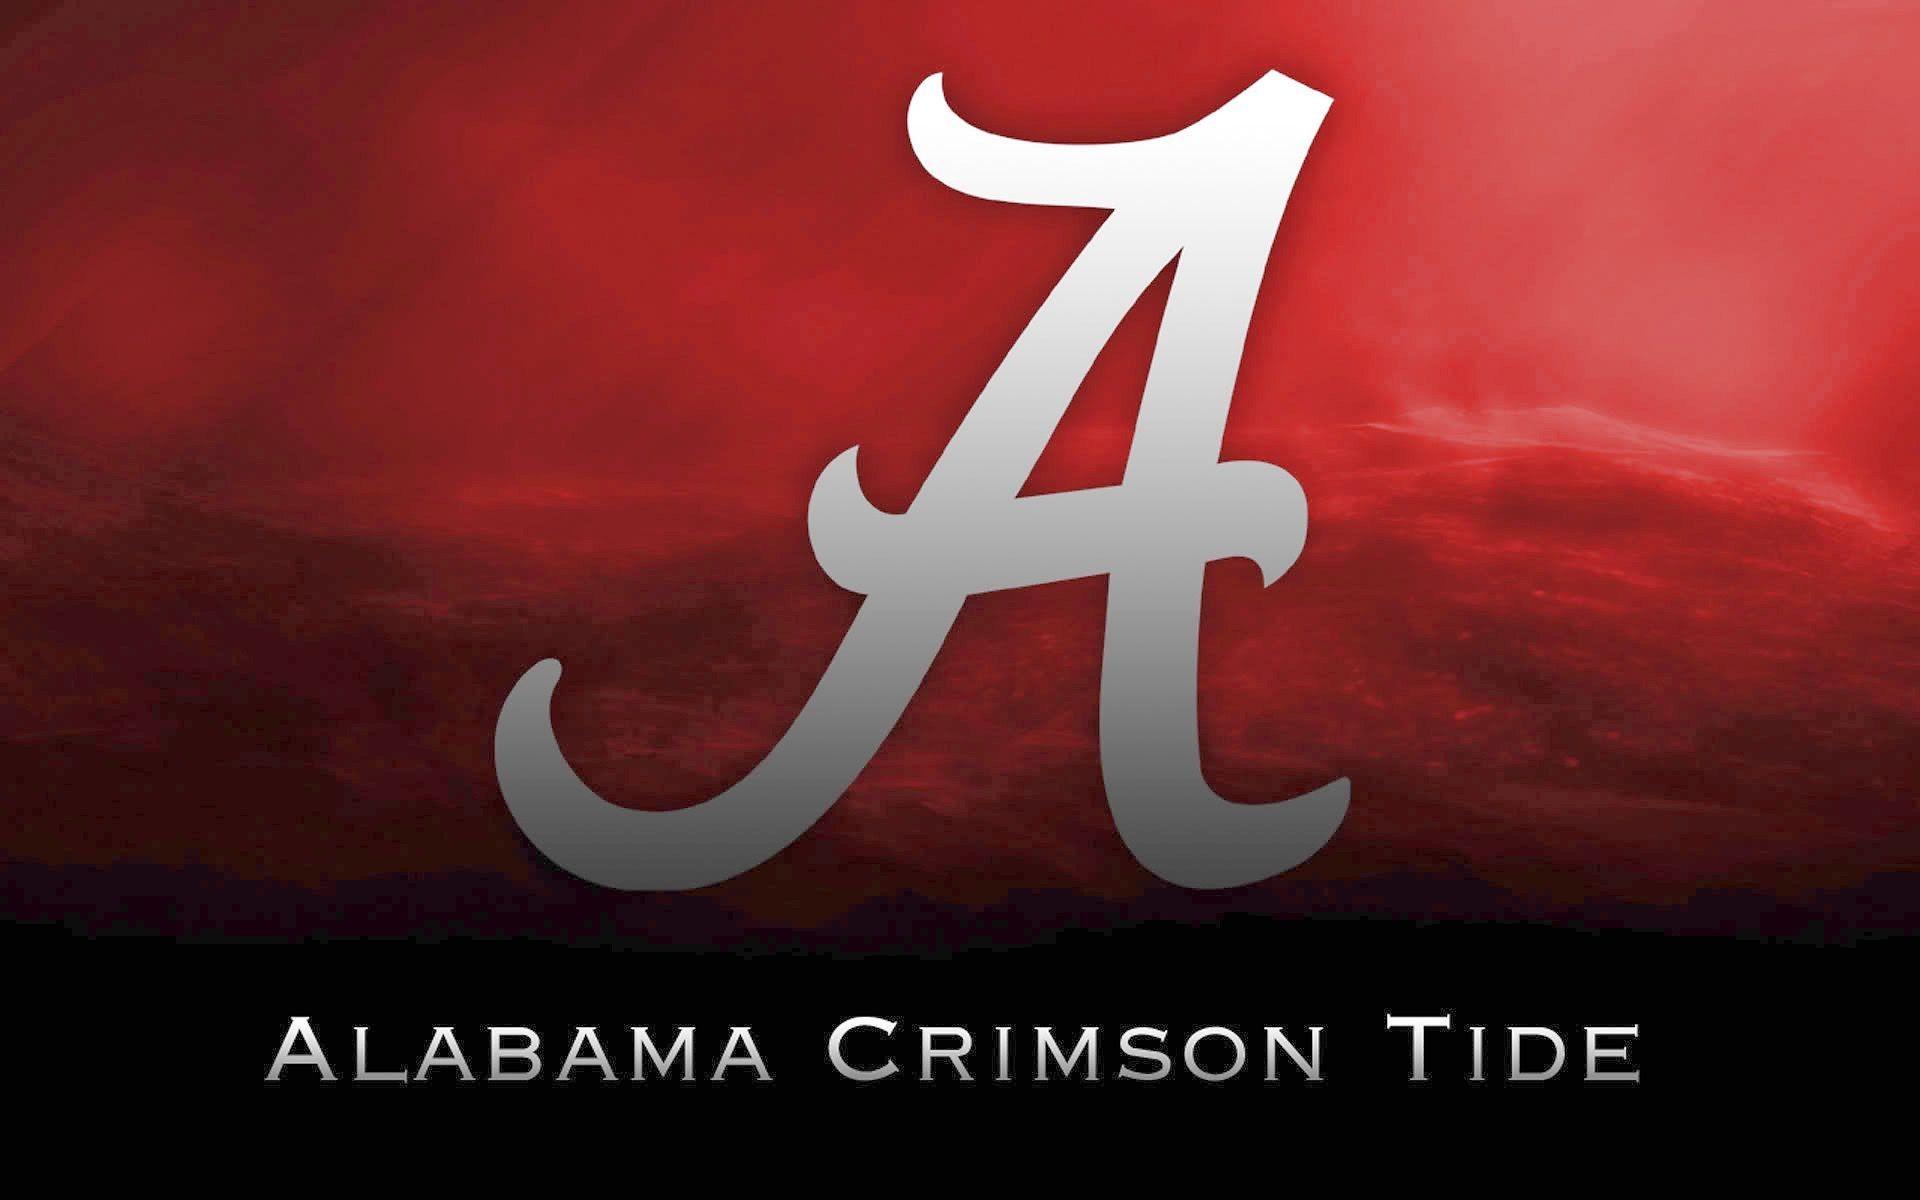 crimson tide paper Alabama wallpapers - alabama desktop wallpapers 1920 x 1200 - 956k - jpg 38 alabama crimson tide 1920 x 1080 - 344k - jpg 18 ohio state buckeyes.